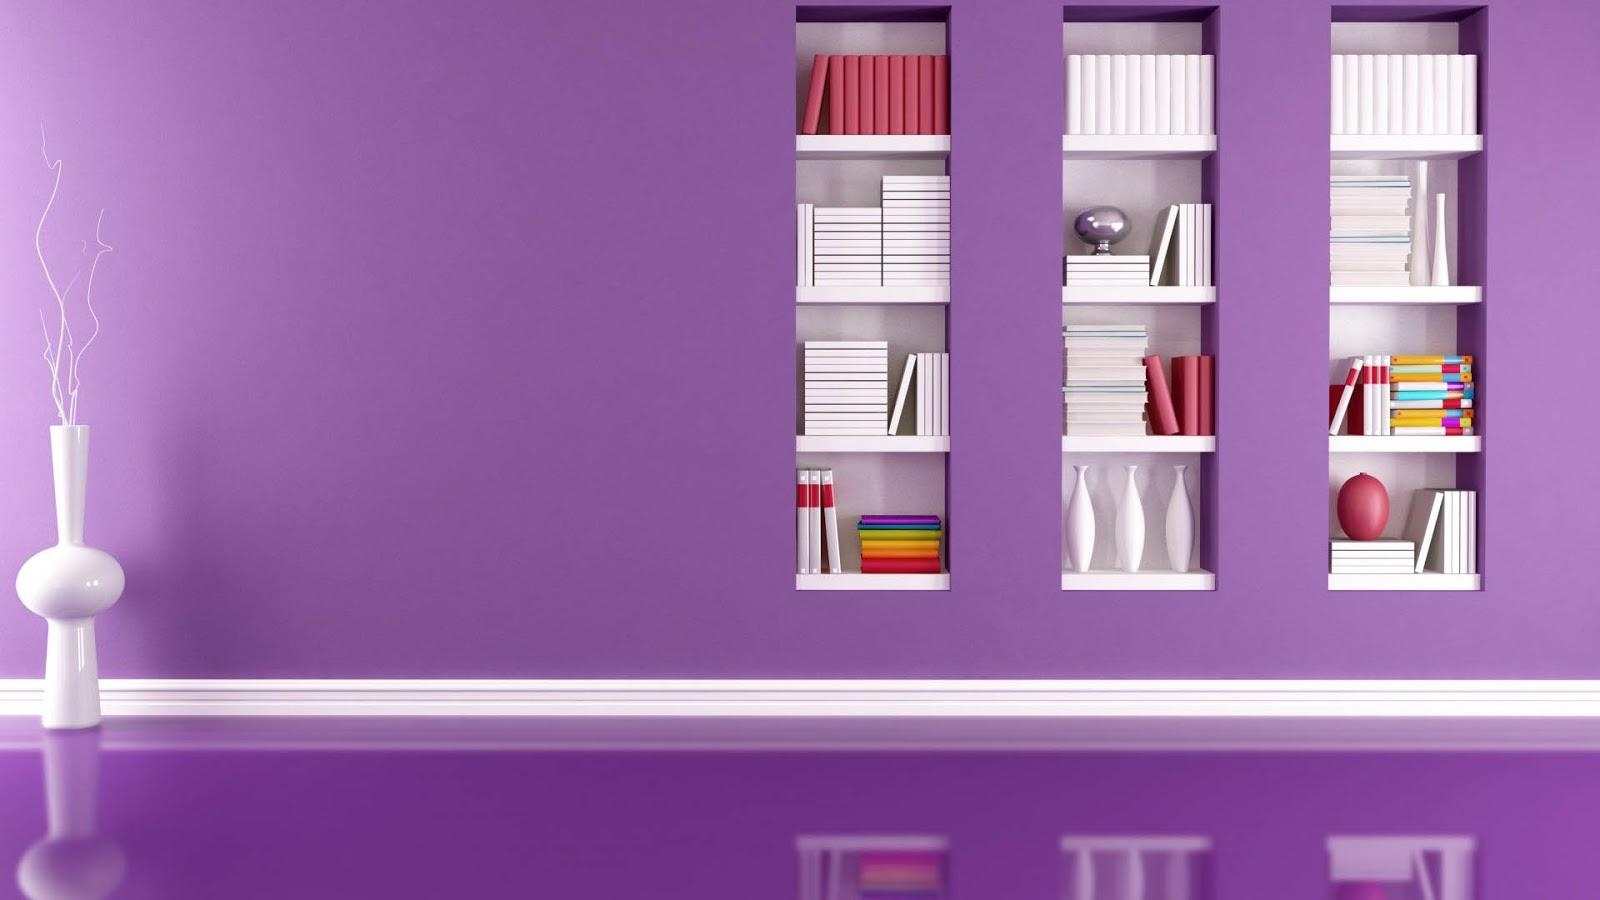 Beautiful wallpapers home interior wallpaper for Wallpaper home interior 2015